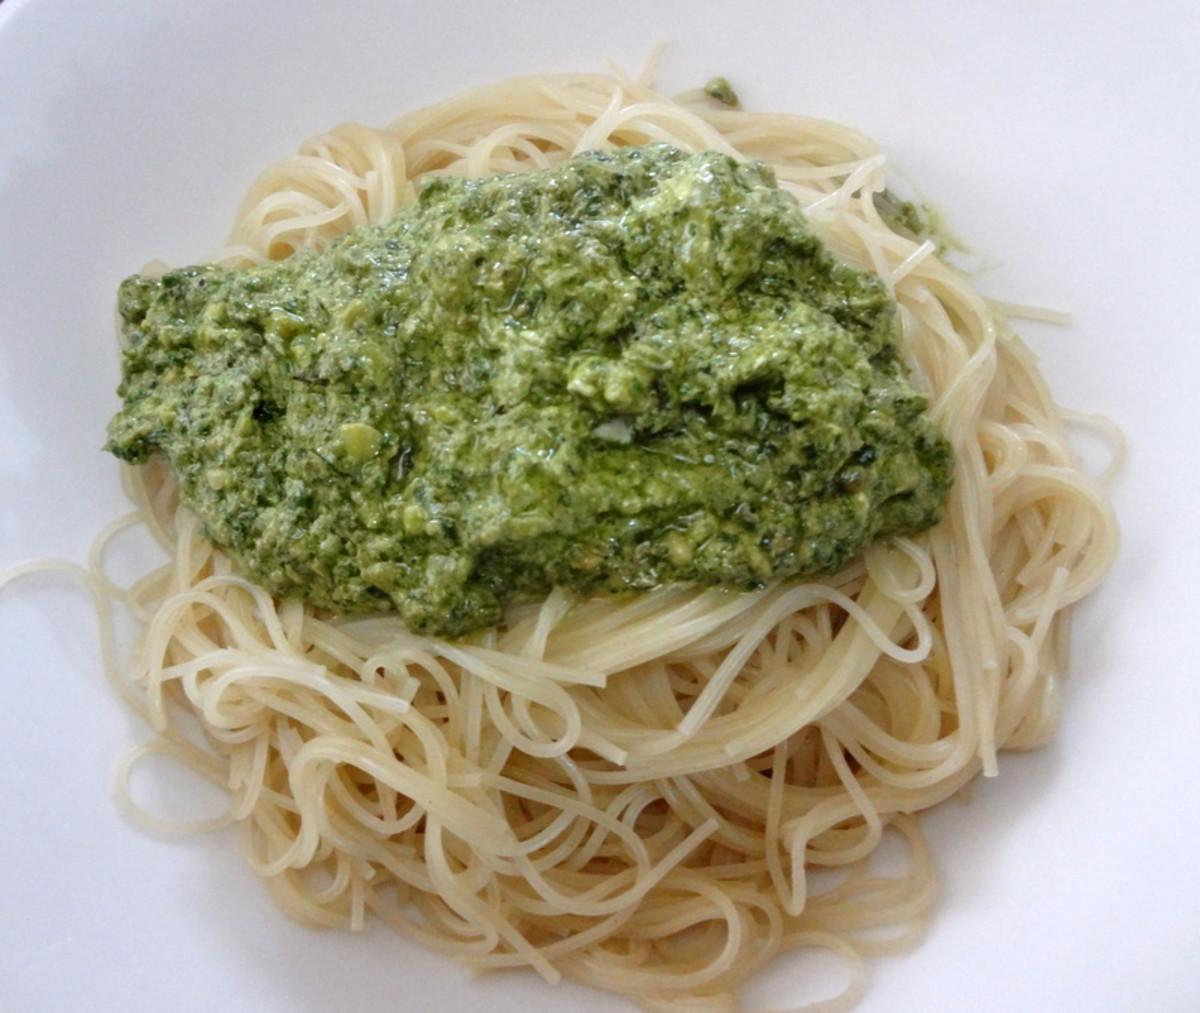 How to Make Basil Pesto: Pesto Sauce Recipes